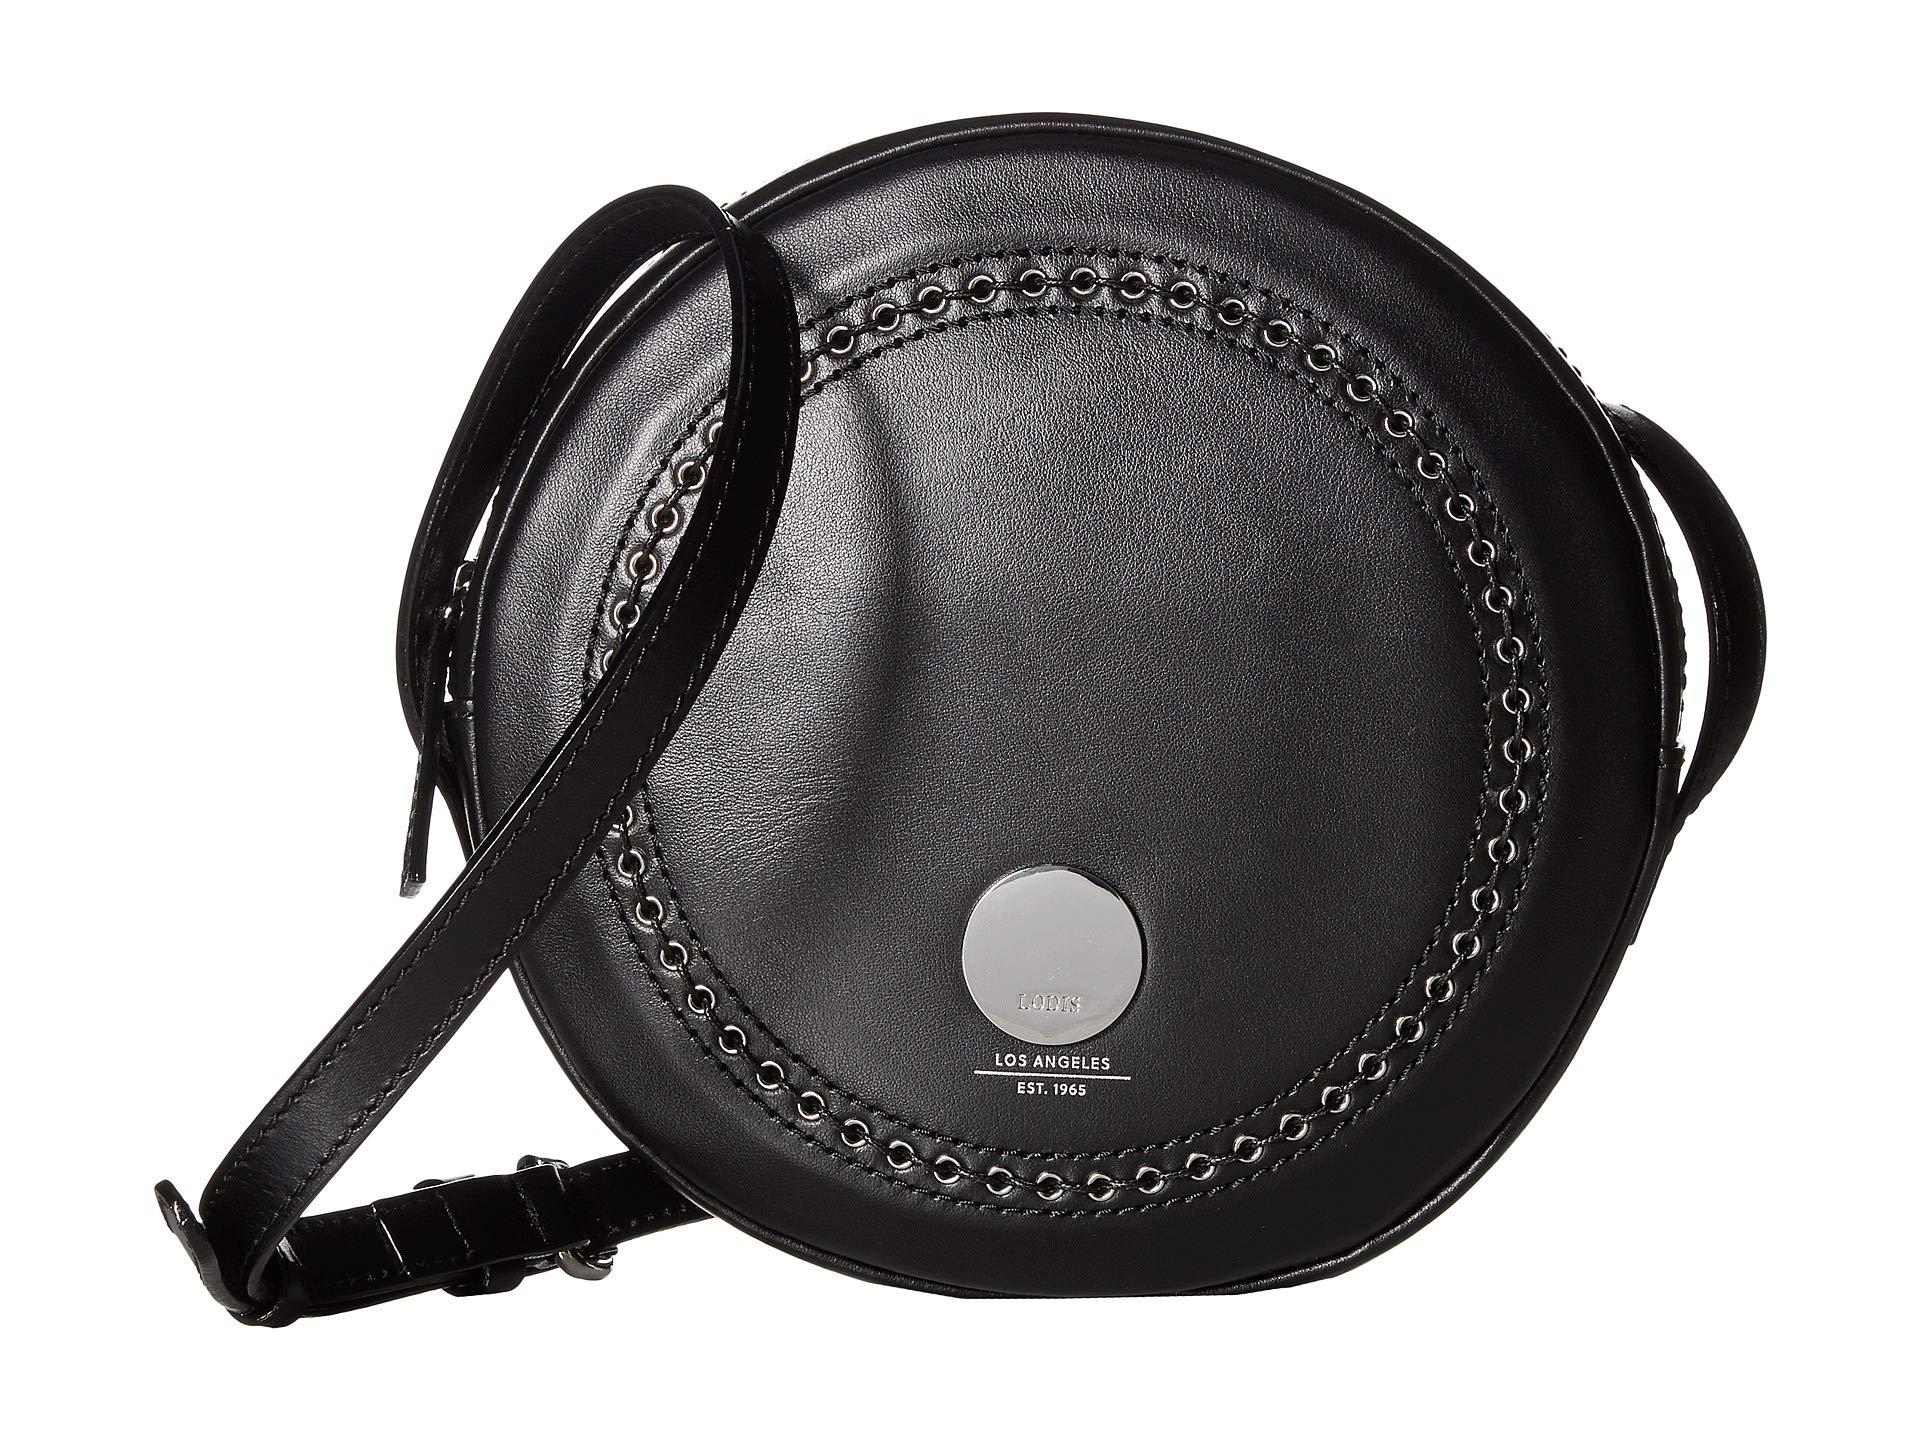 Lodis Black Accessories Juna Crossbody Saratoga Circle nB1xZ4